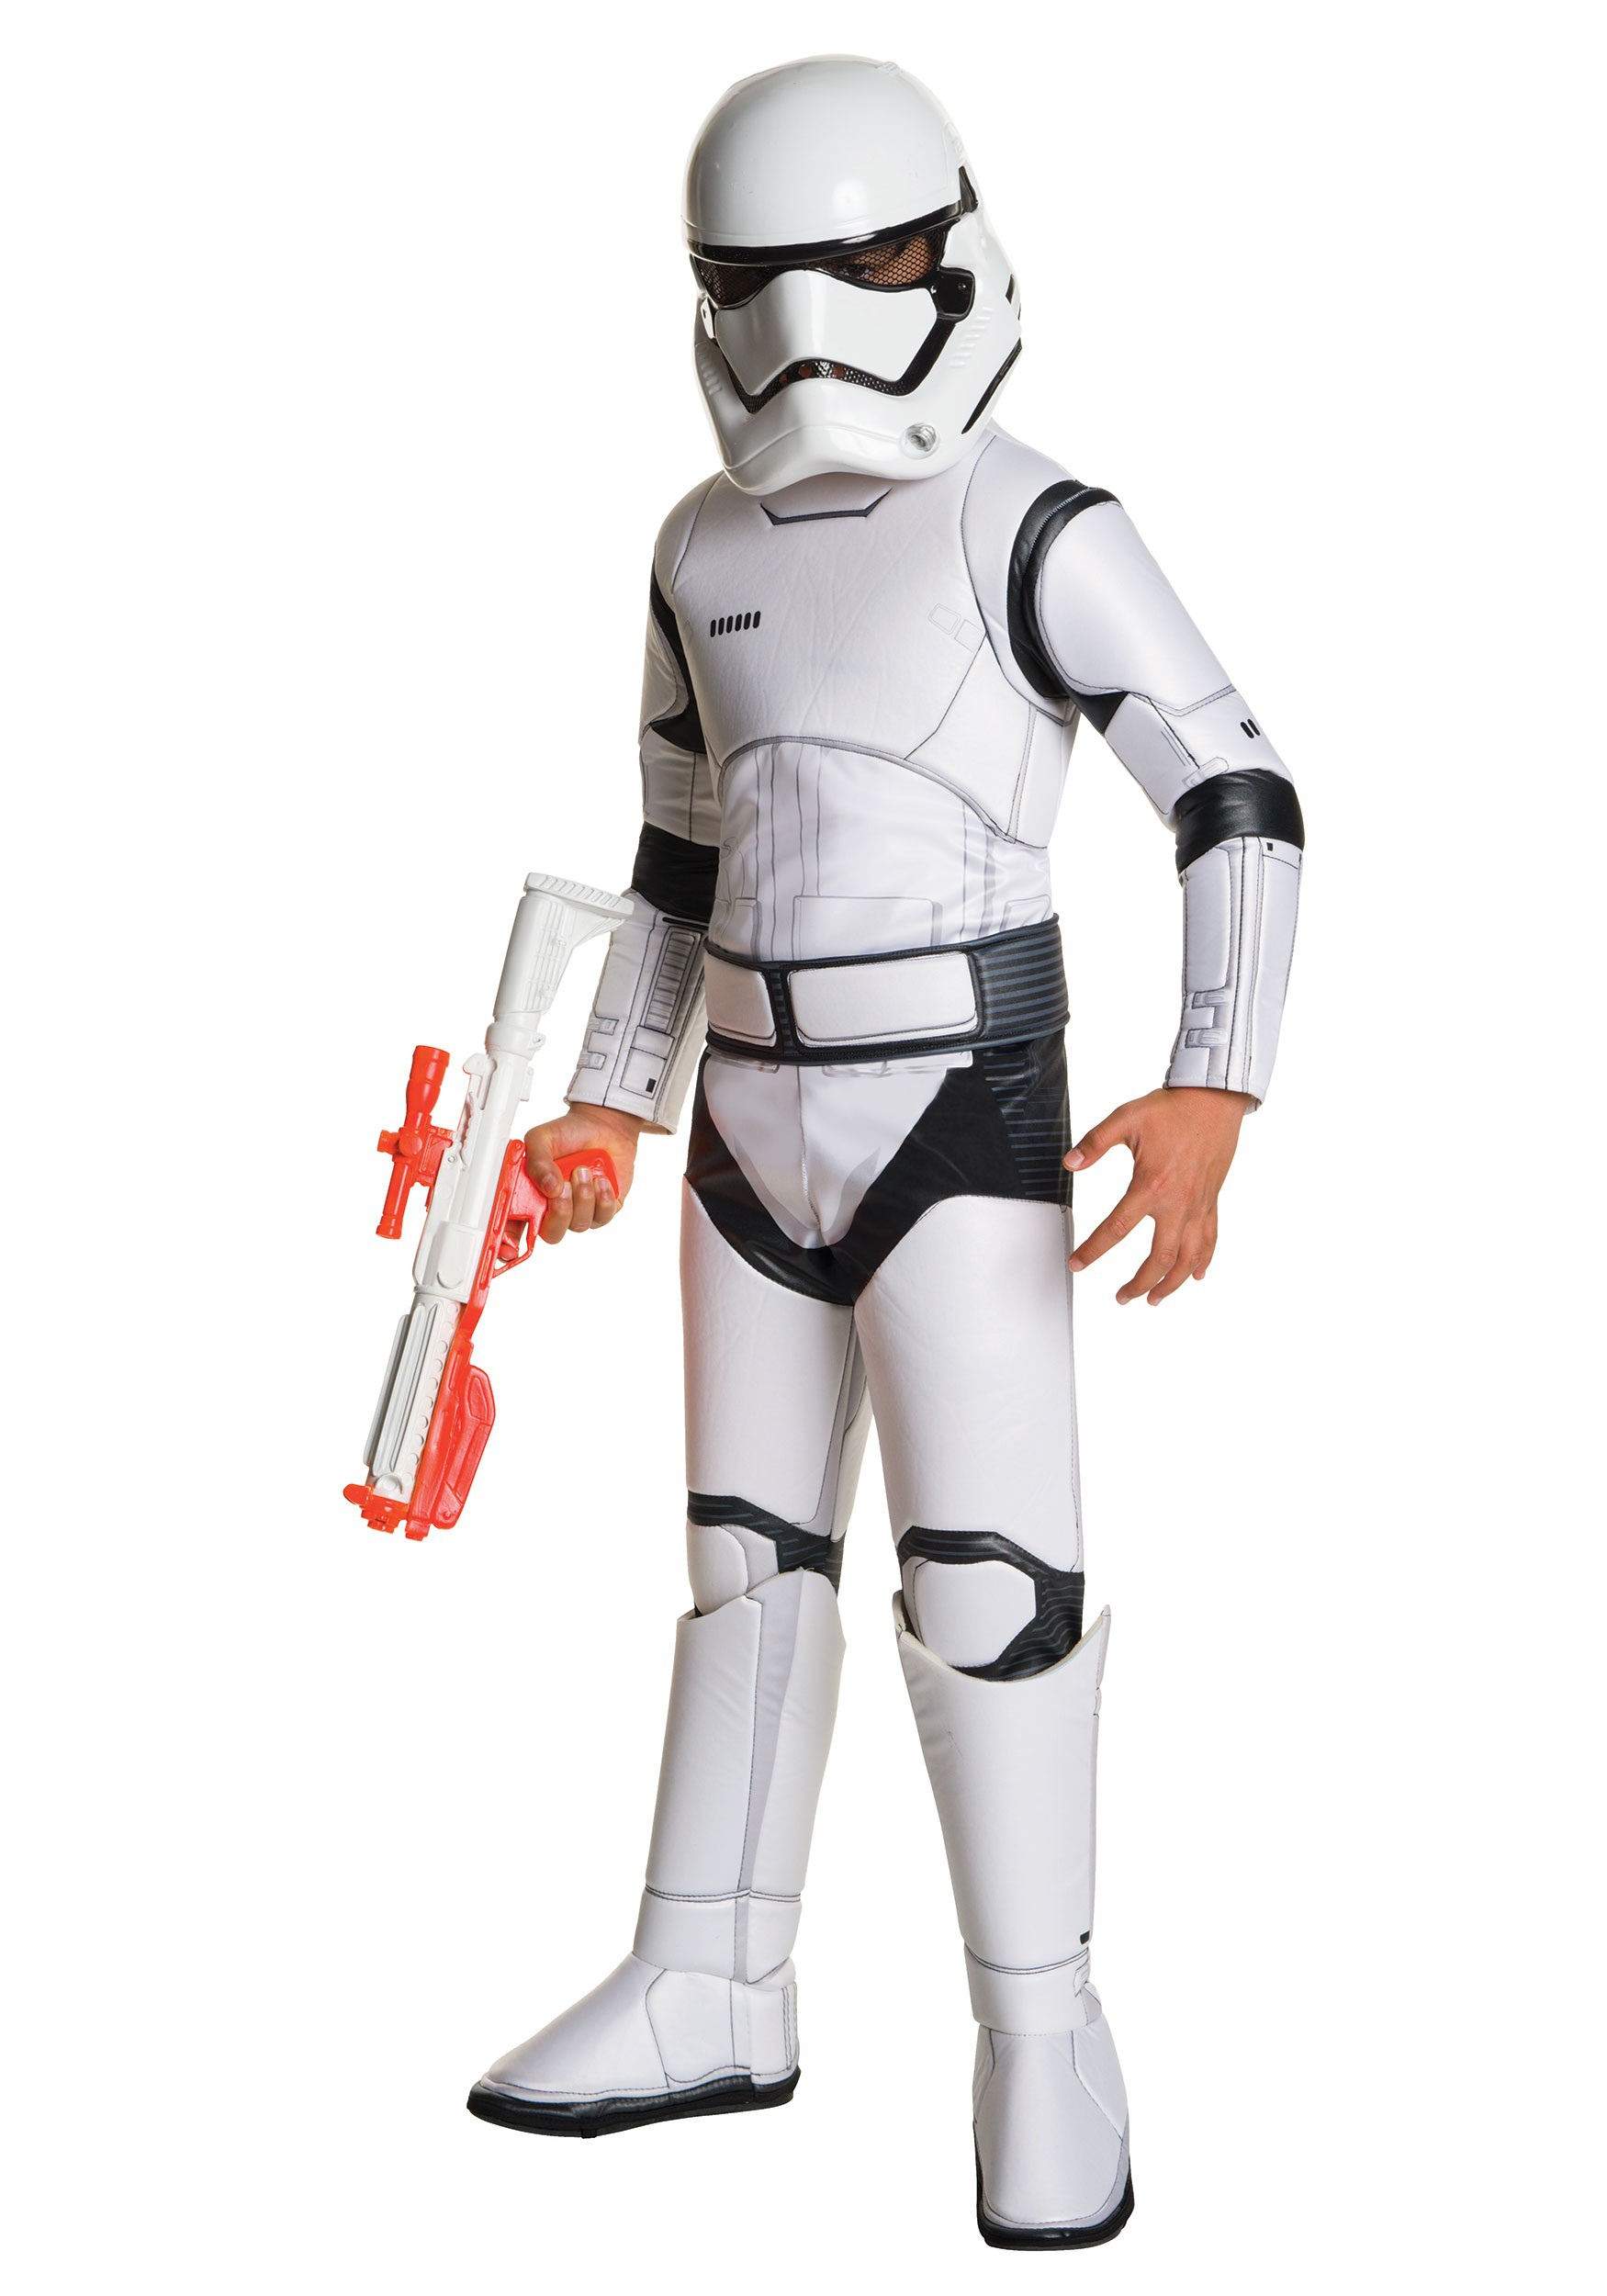 3ef79e3e5c0 Disfraz infantil deluxe de Stormtrooper de Star Wars Ep. 7